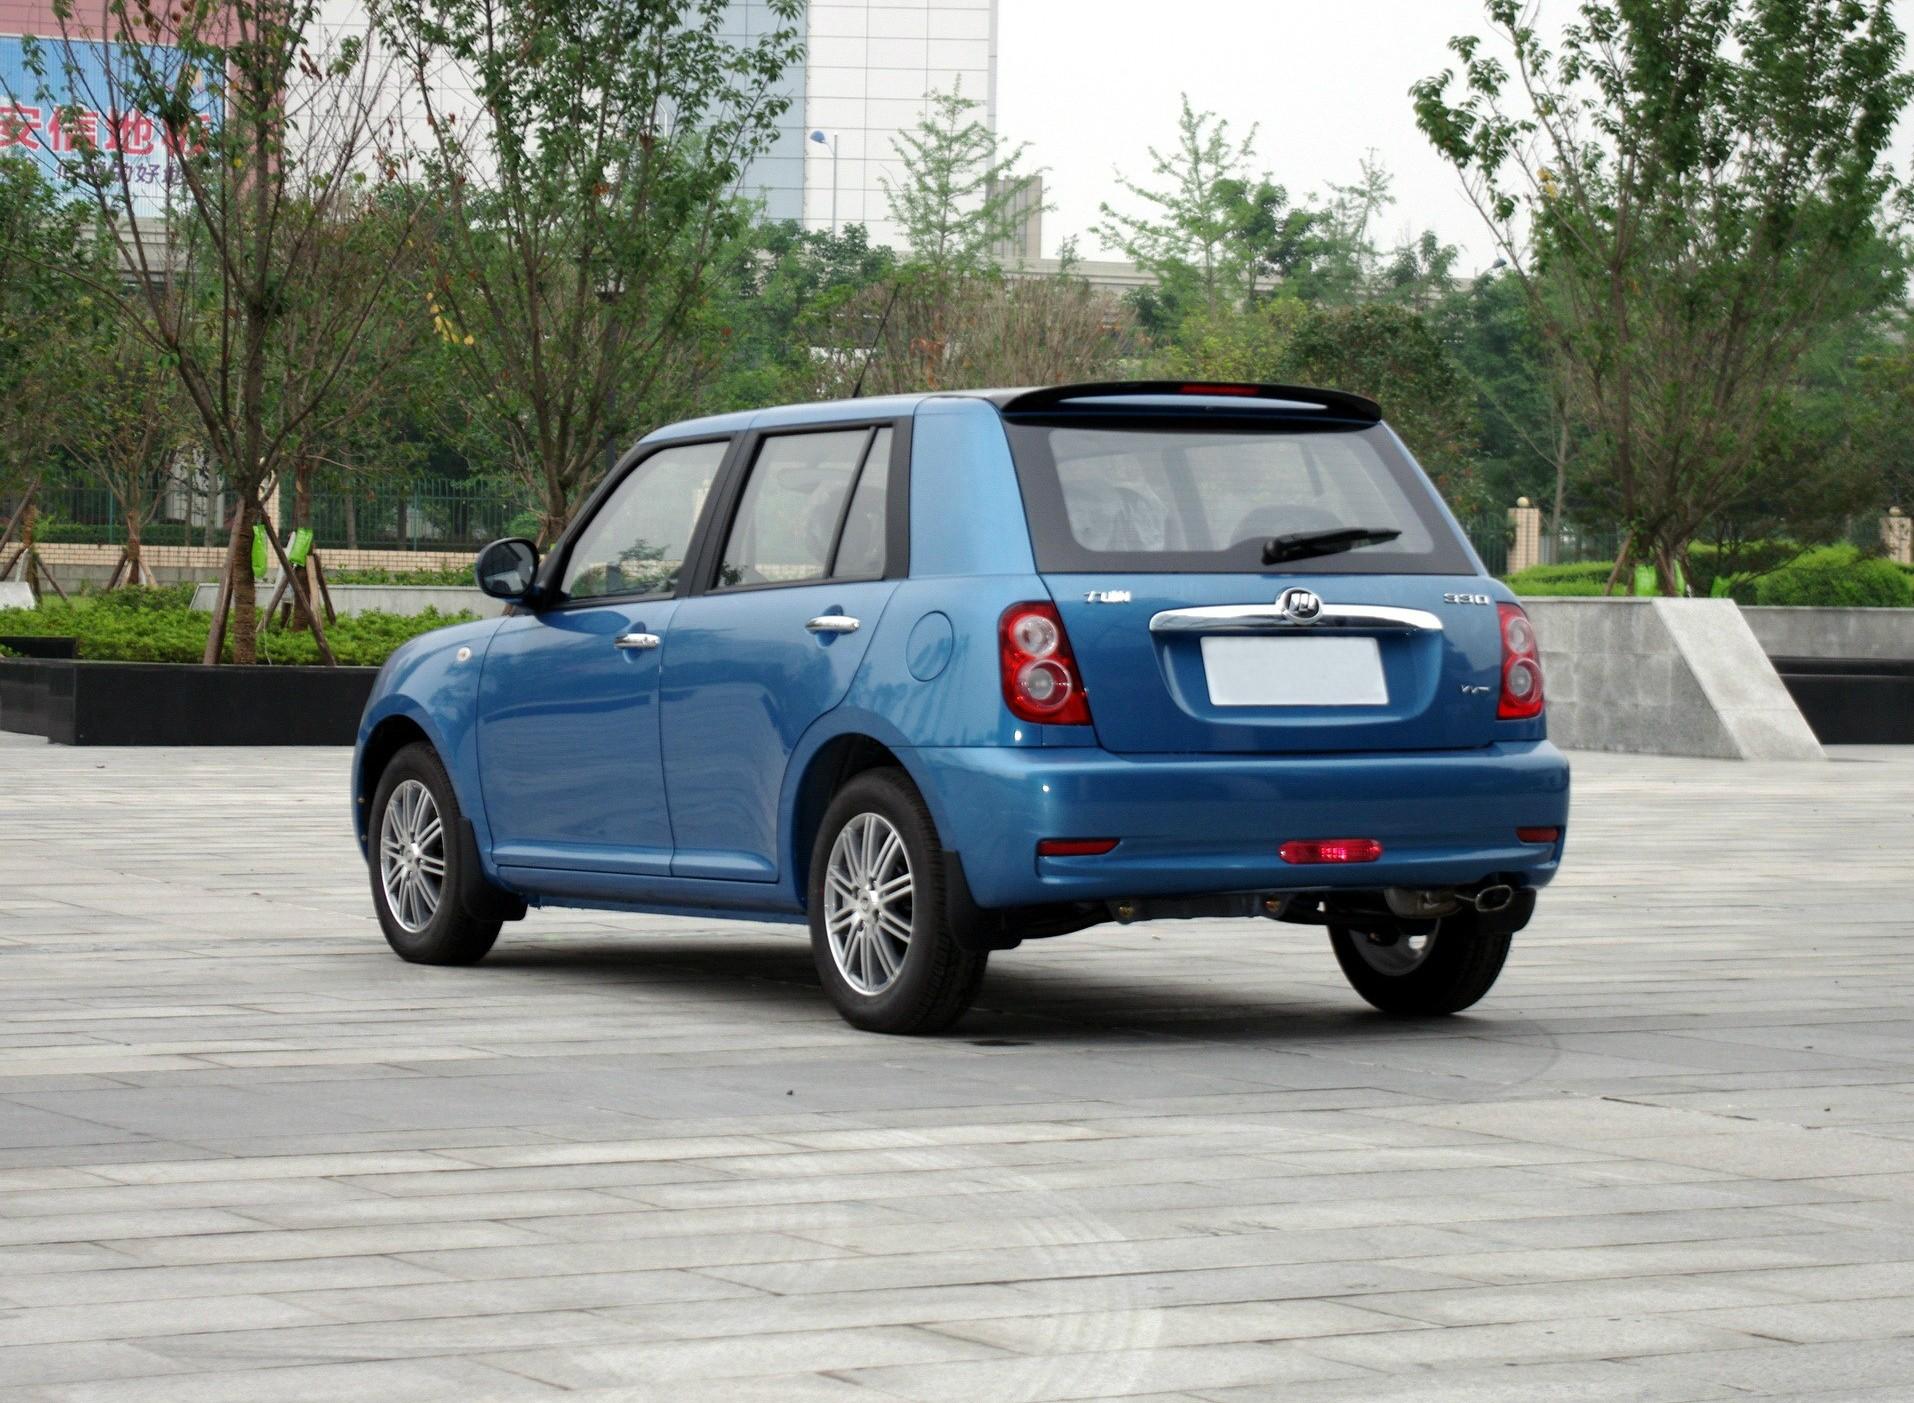 Lifan Smily 330 автомобиль